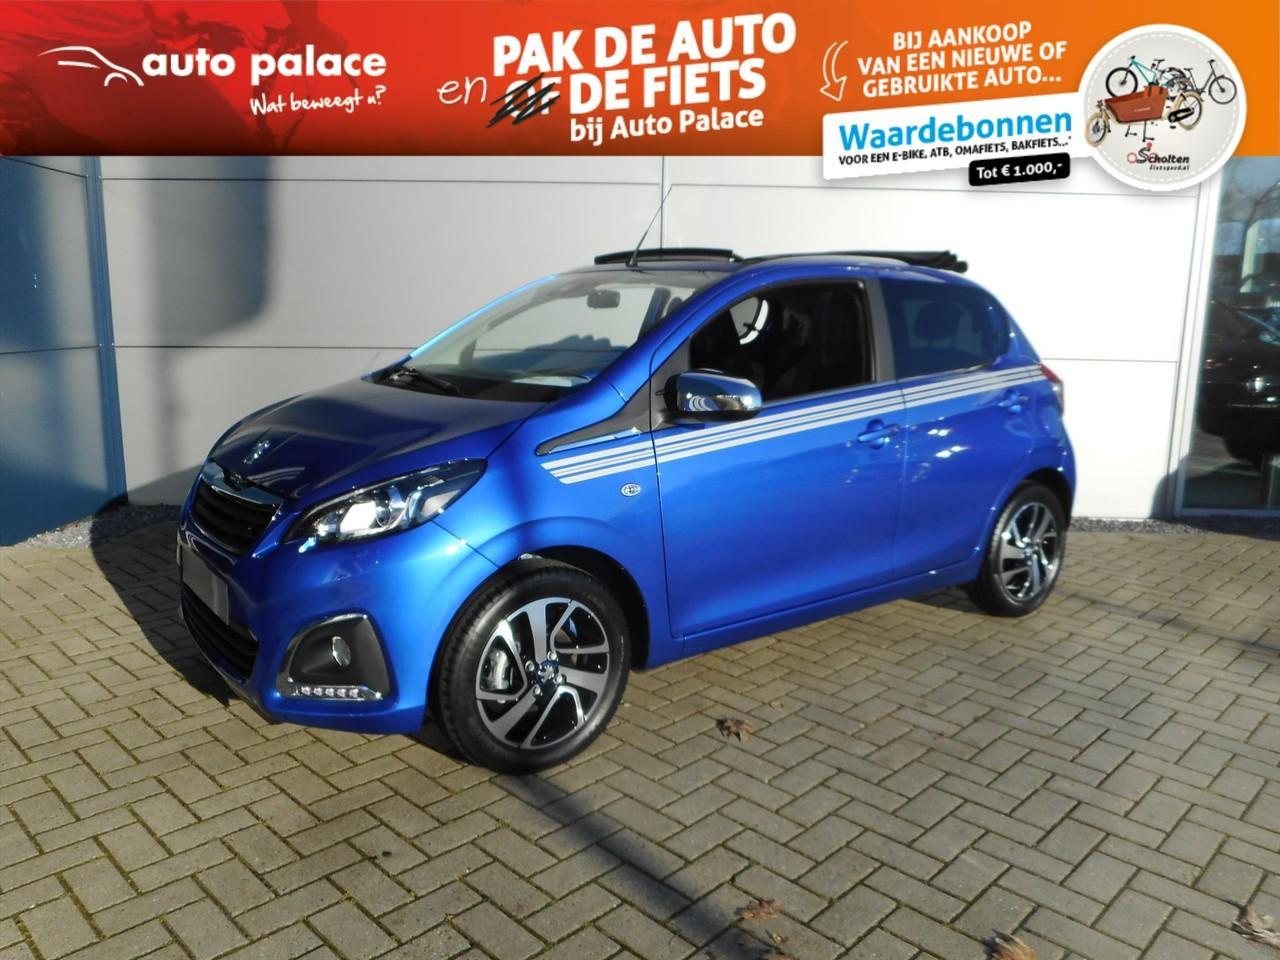 Peugeot 108 1.0 e-vti 72pk 5d top! collection